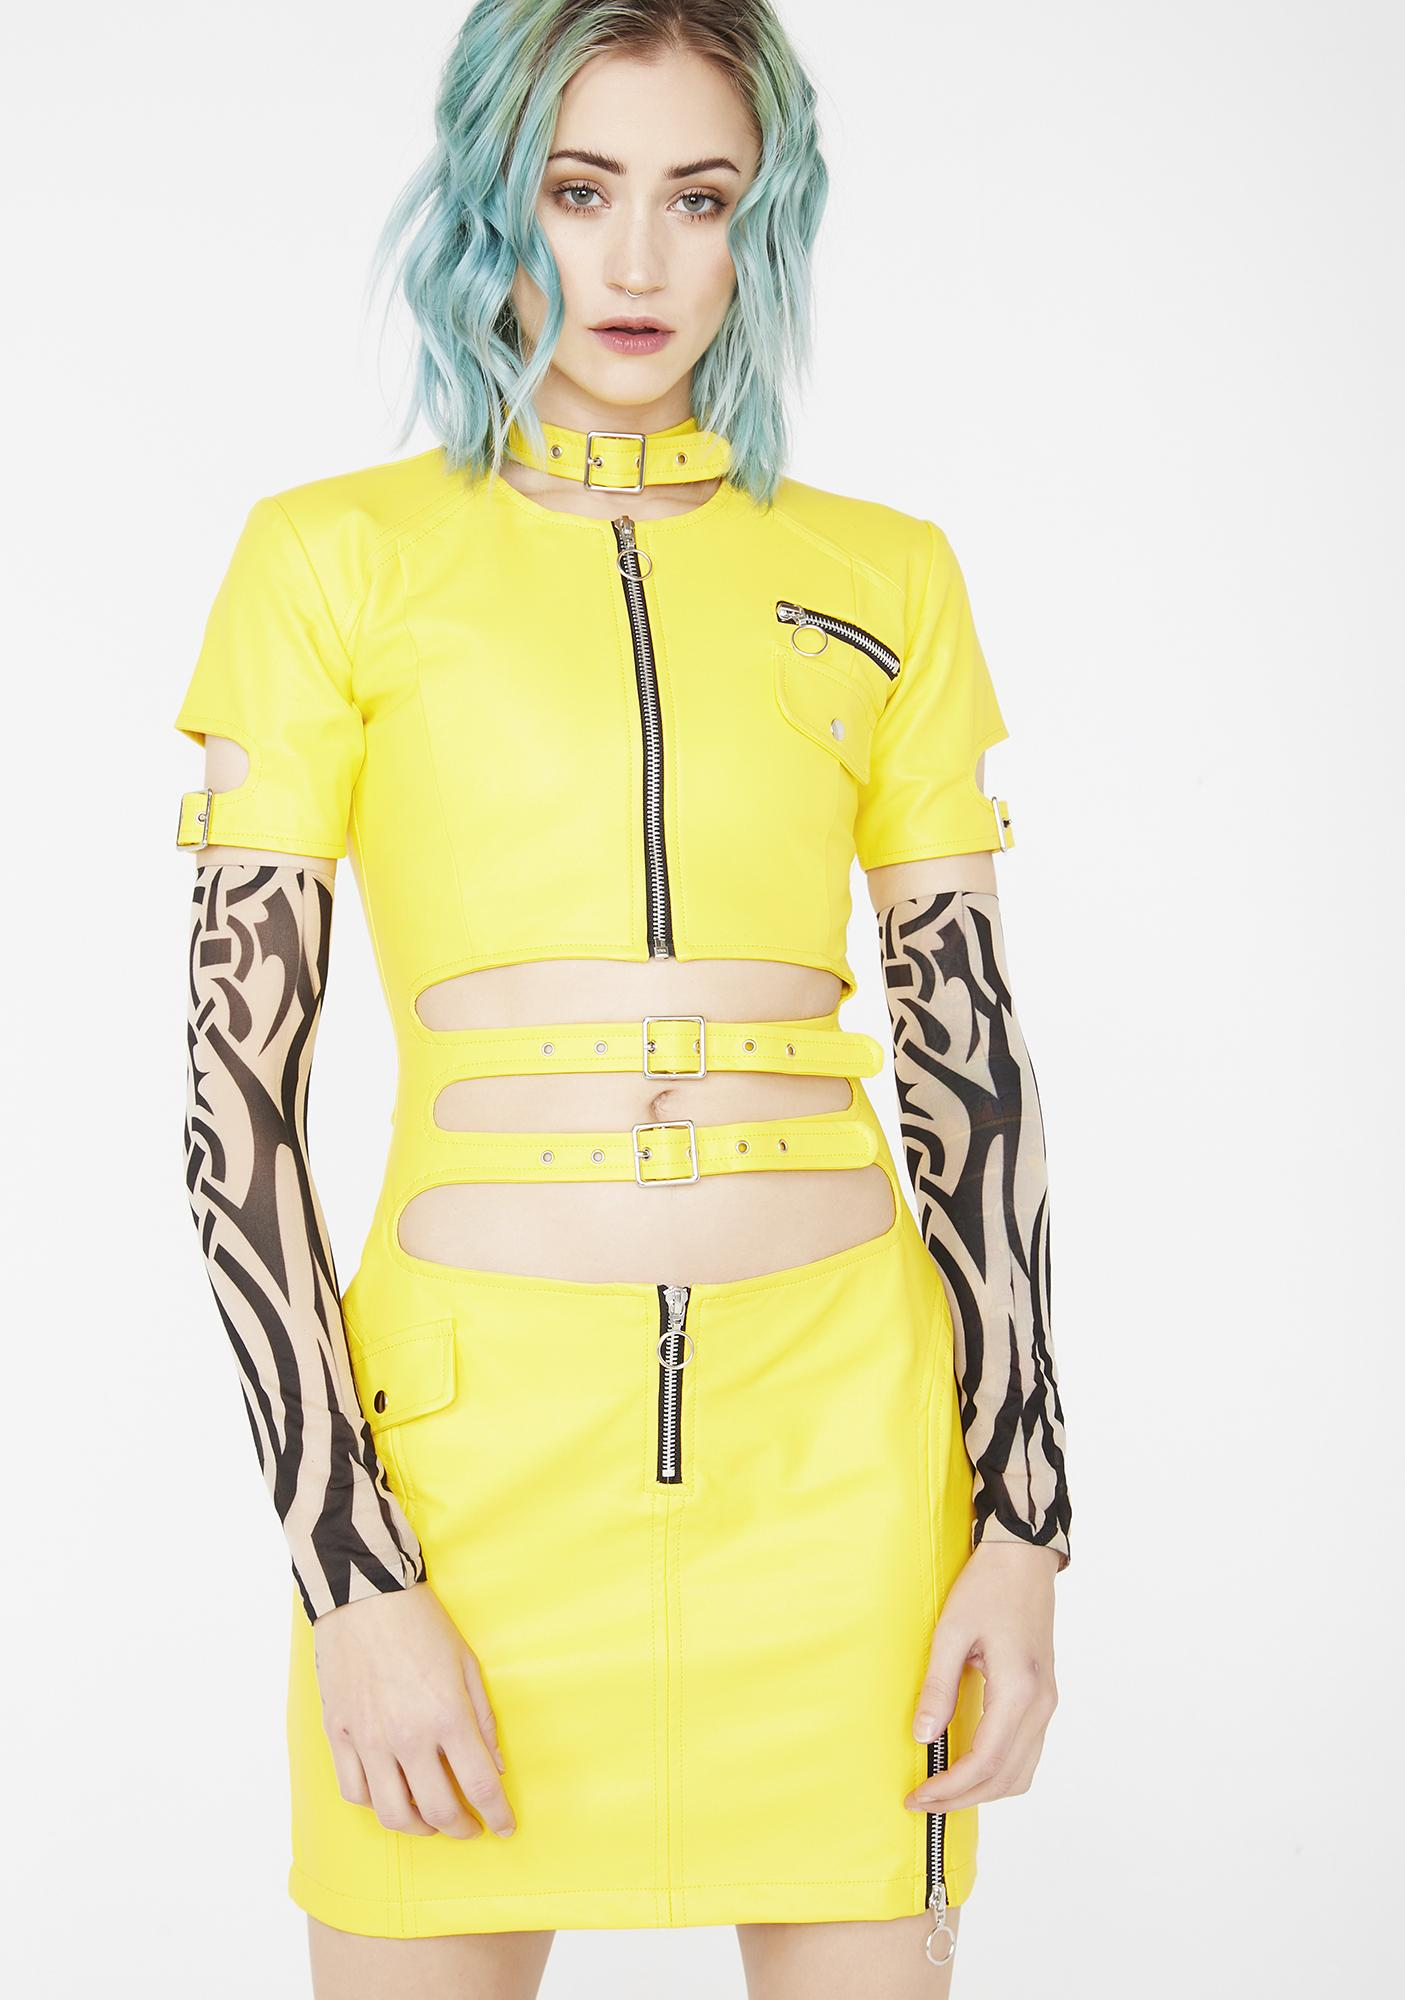 Strange Couture Faster Pussycat Vegan Leather Dress